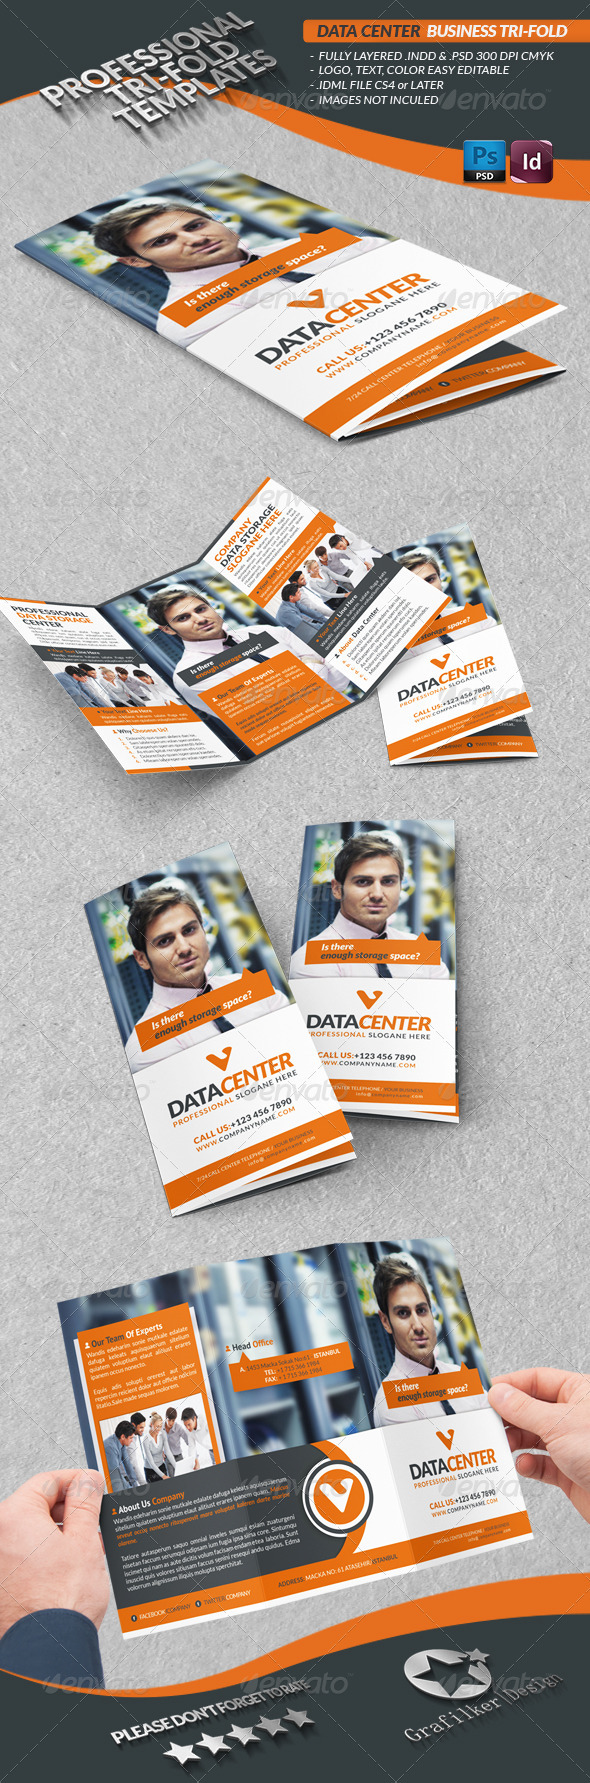 GraphicRiver Data Center Business Tri-Fold 3671188